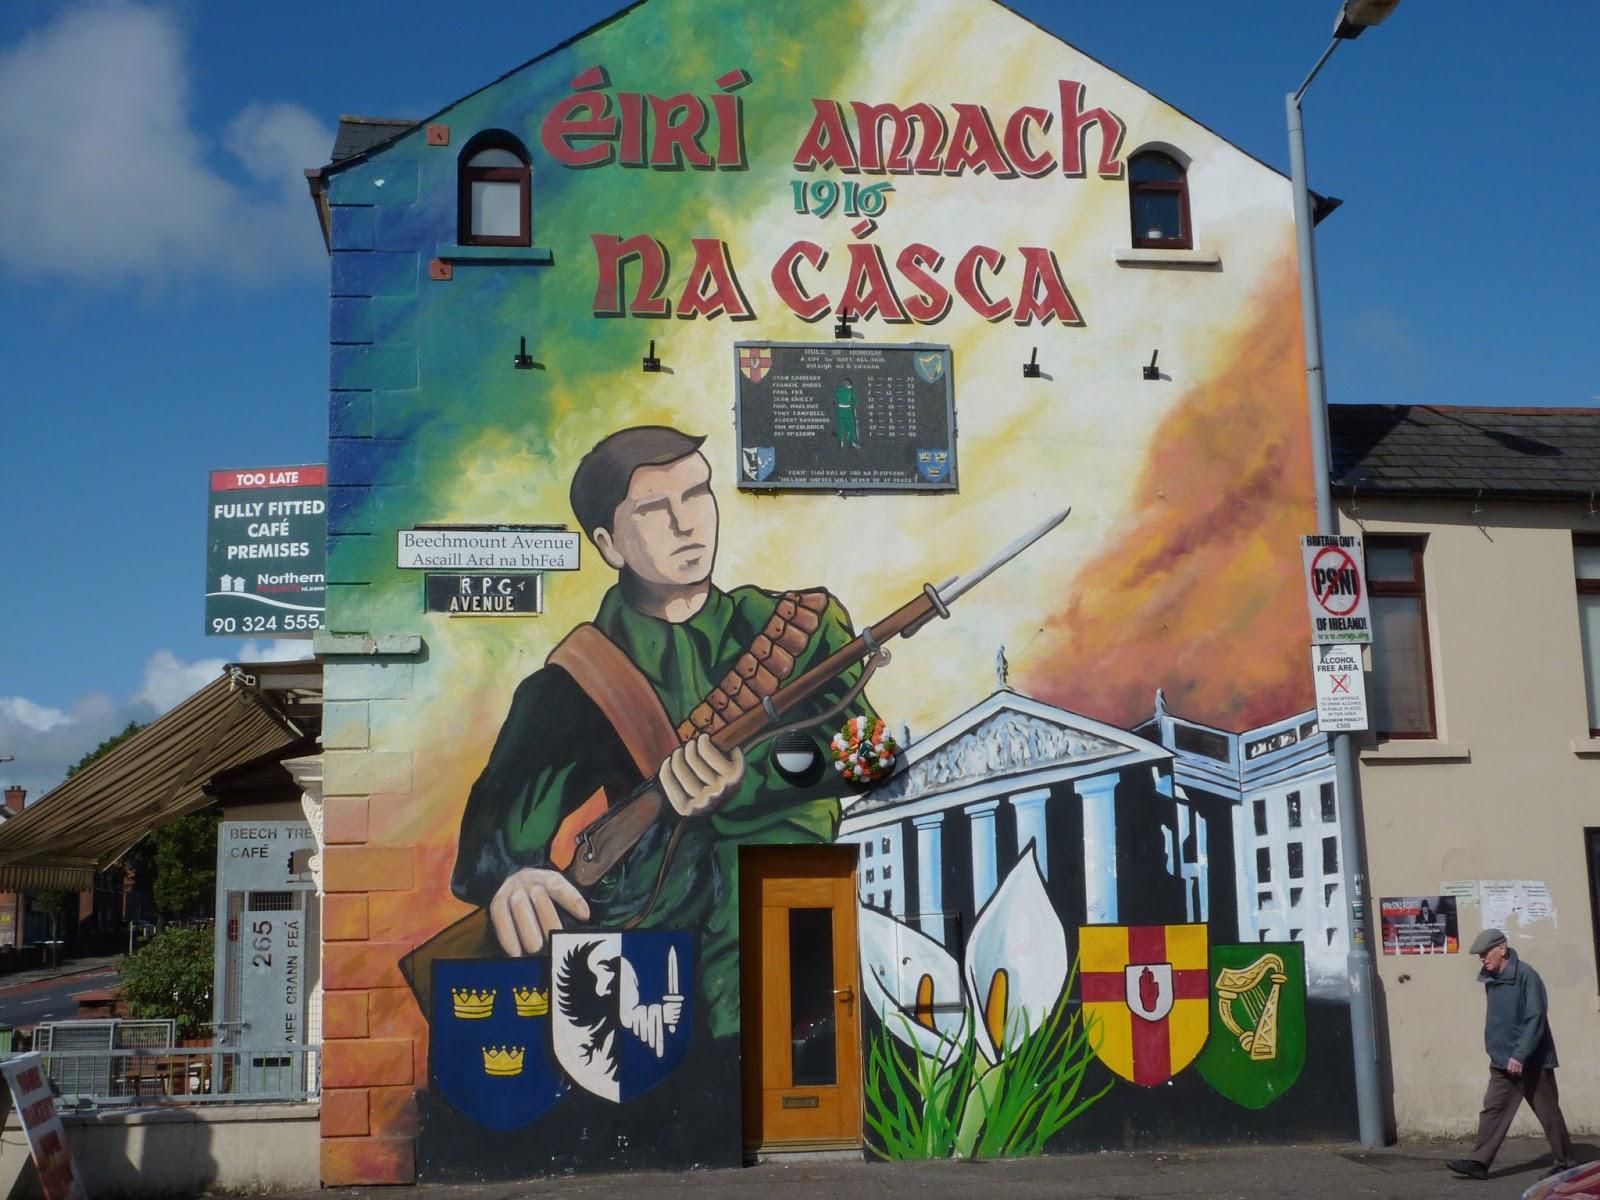 Histoire s de voyager juillet 2013 for Easter rising mural